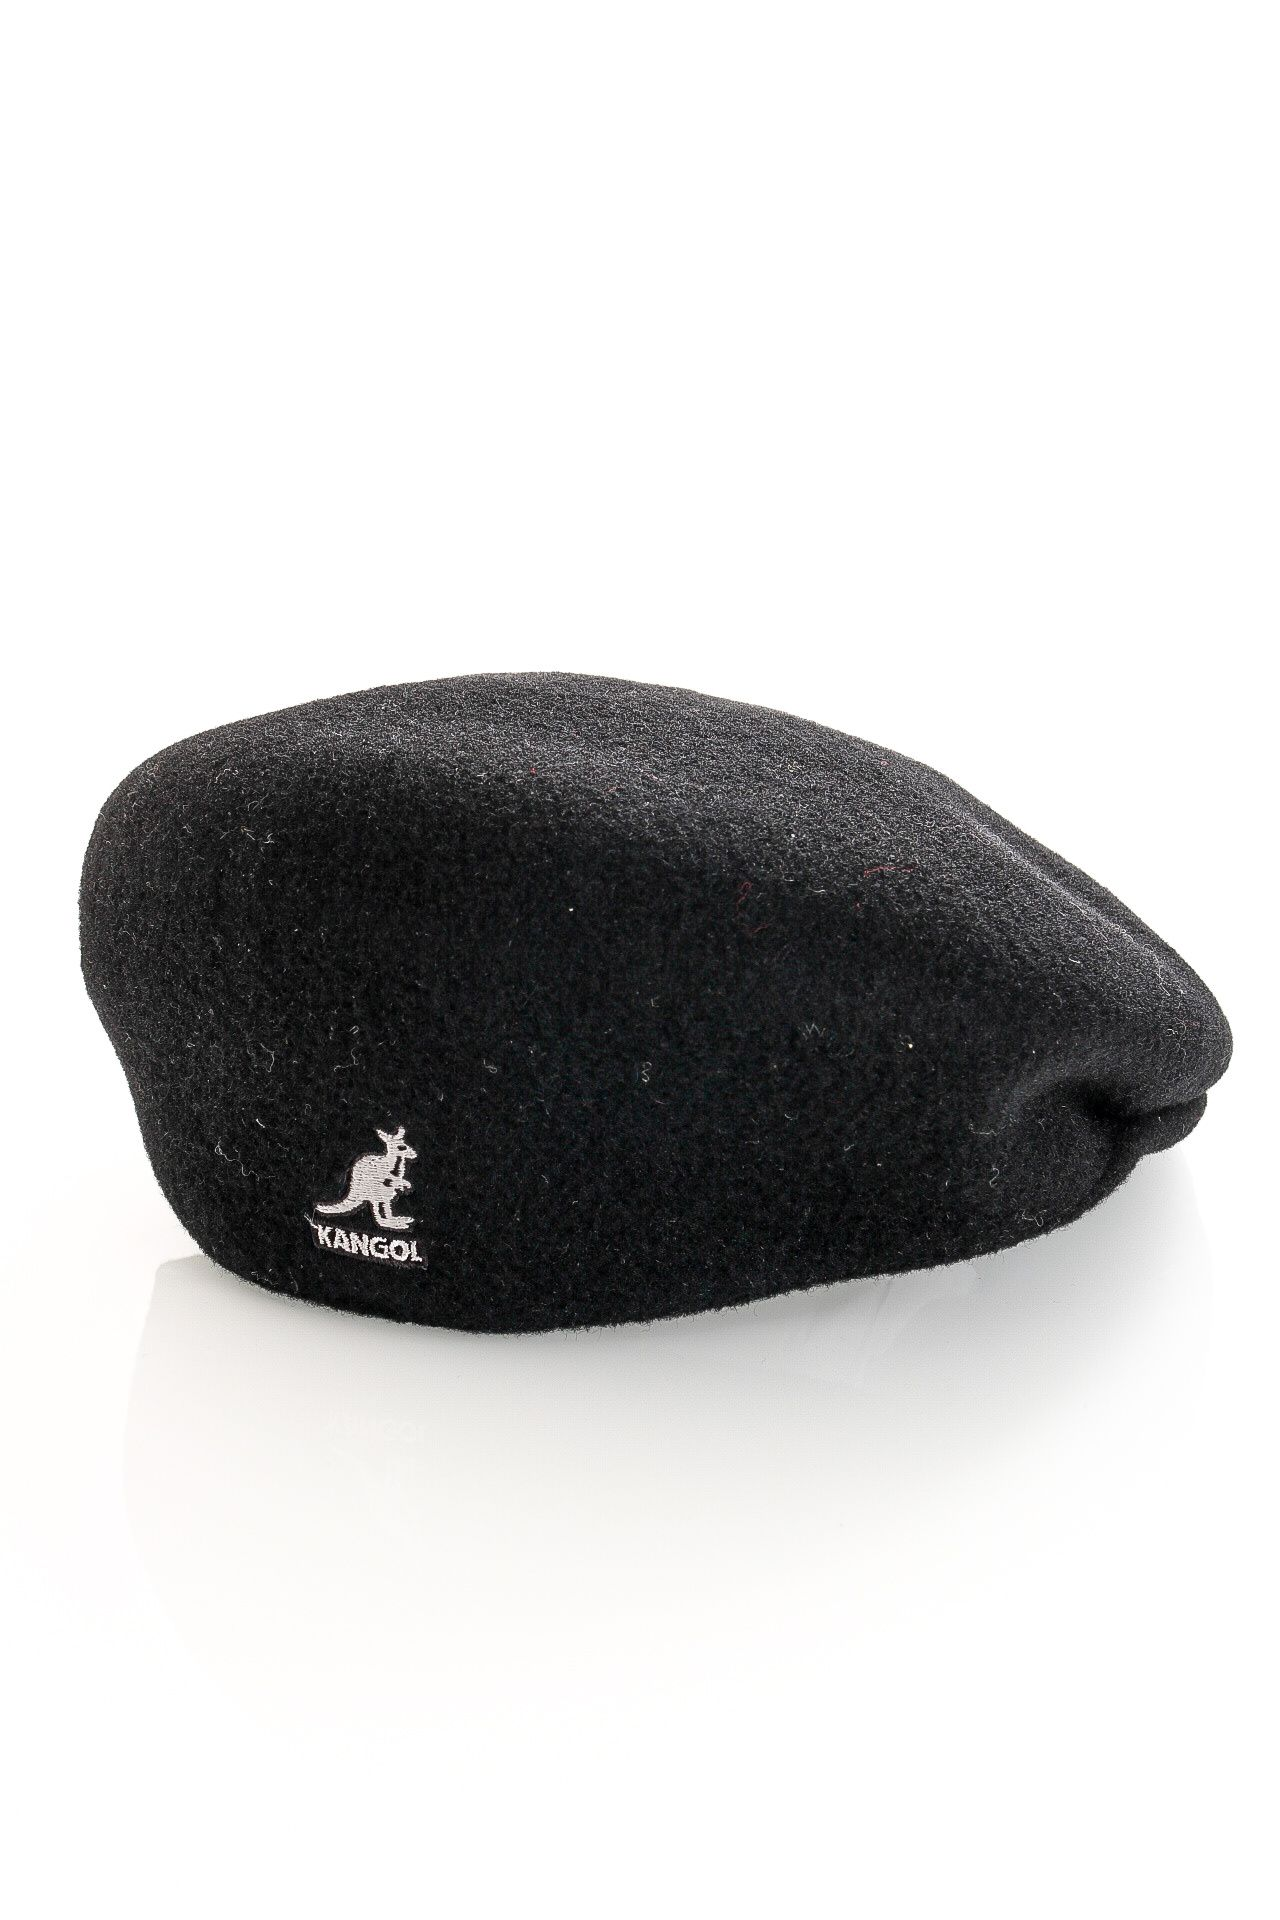 Afbeelding van Kangol 0258Bc Flat Cap Wool 504 Zwart